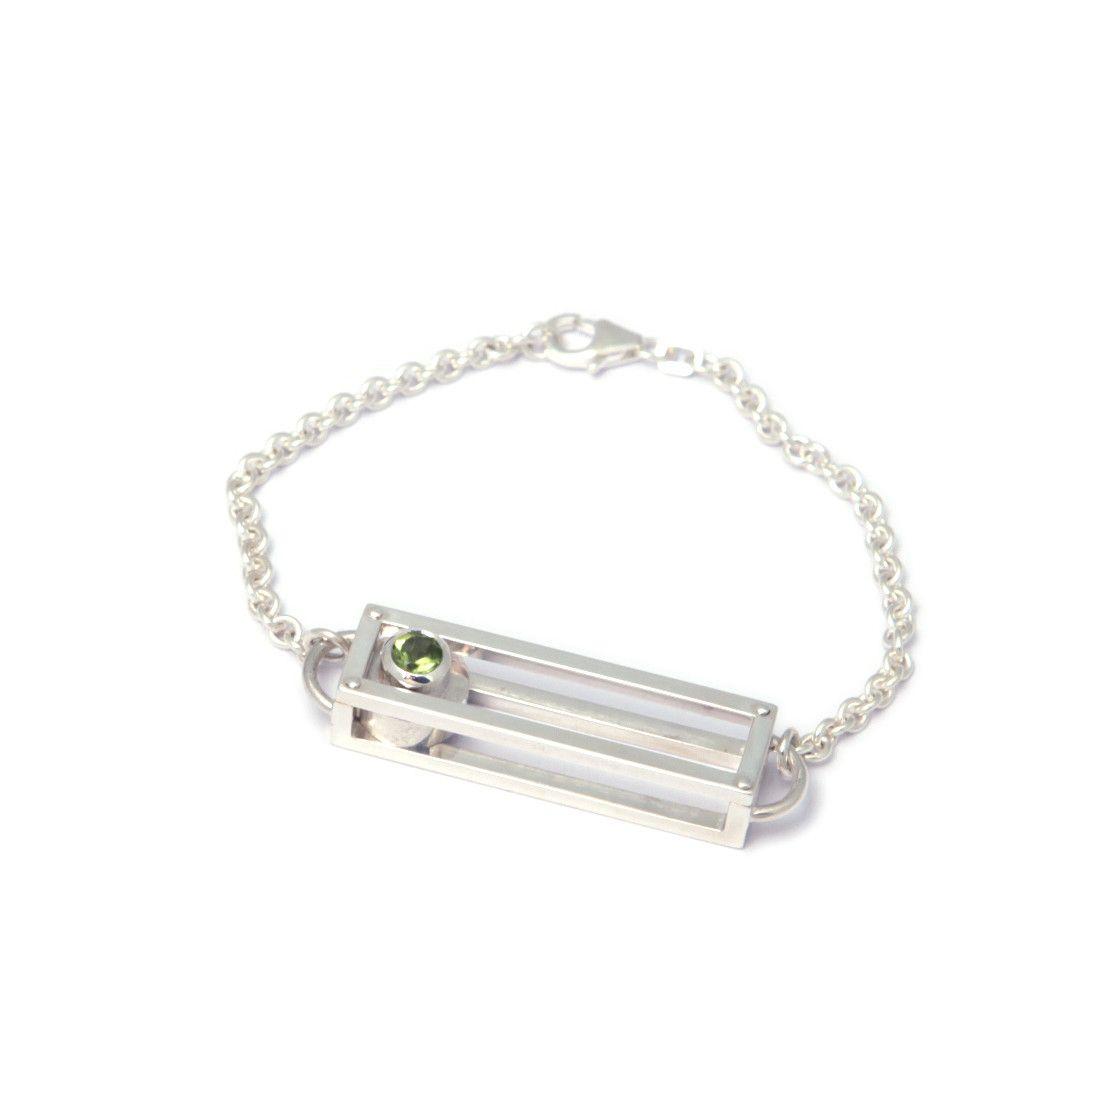 Nicole Van Der Wolf  Shipshape Peridot Silver Bracelet